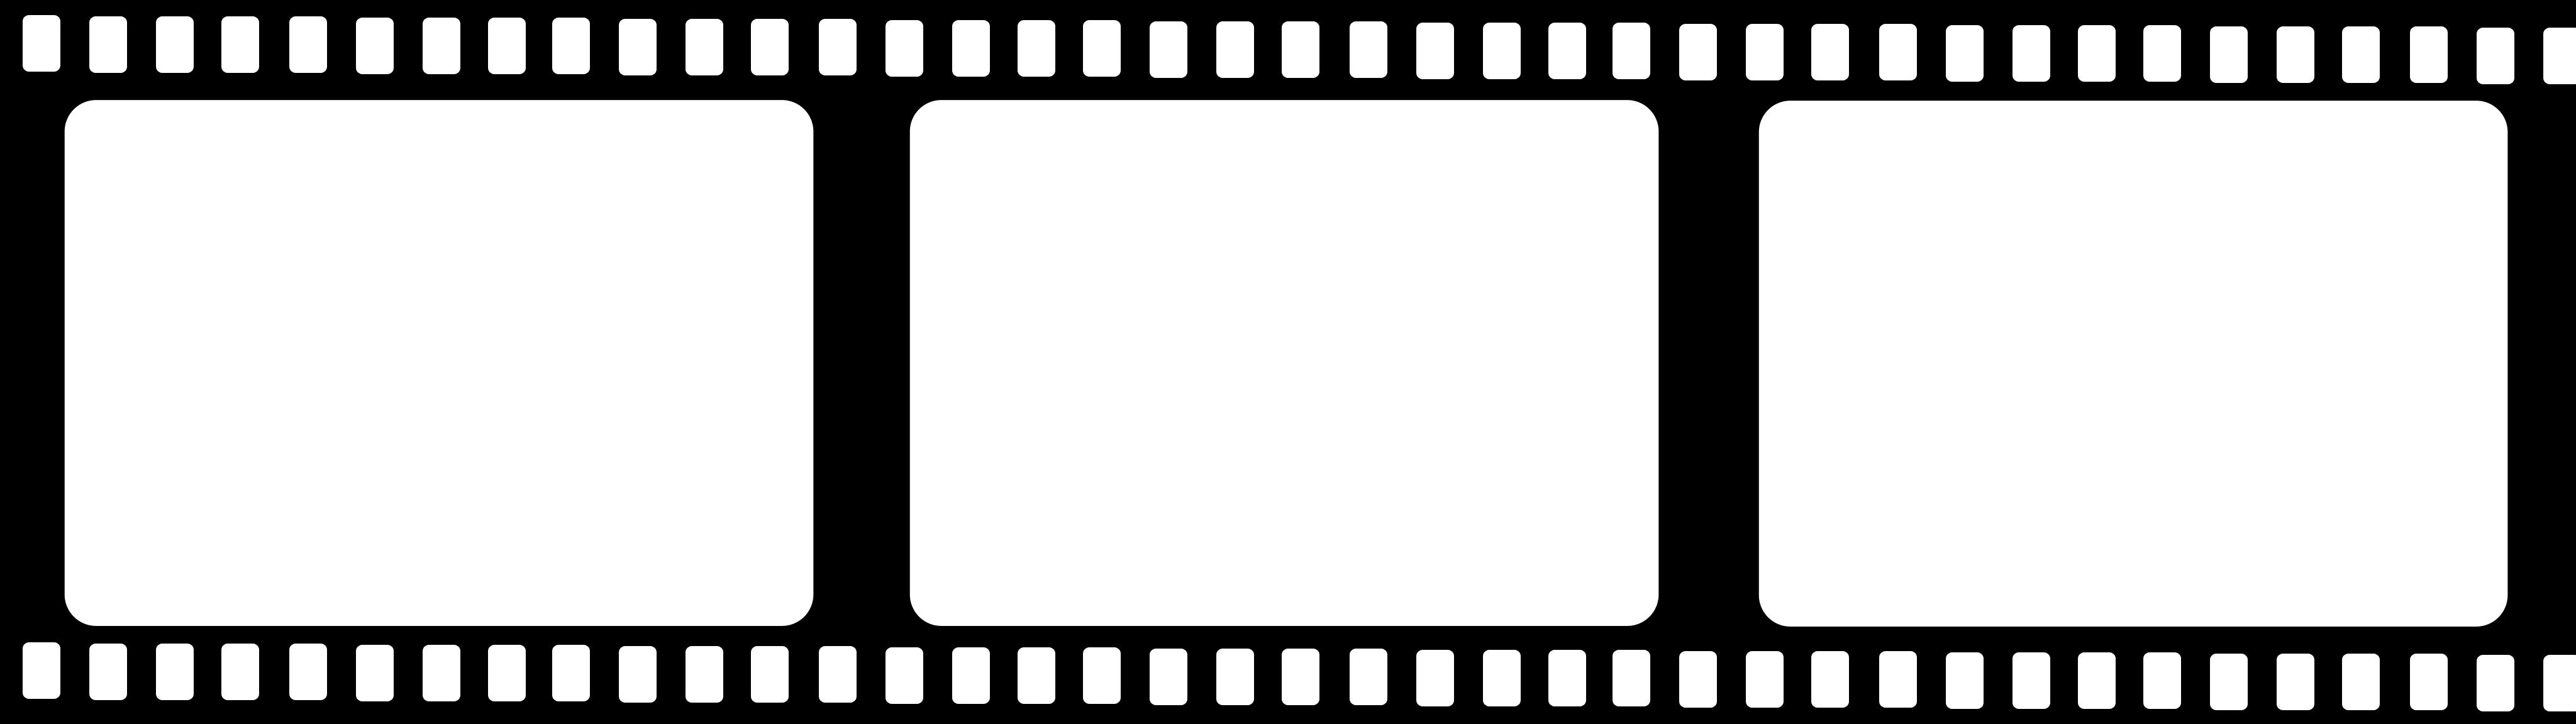 clipart movie film - photo #7